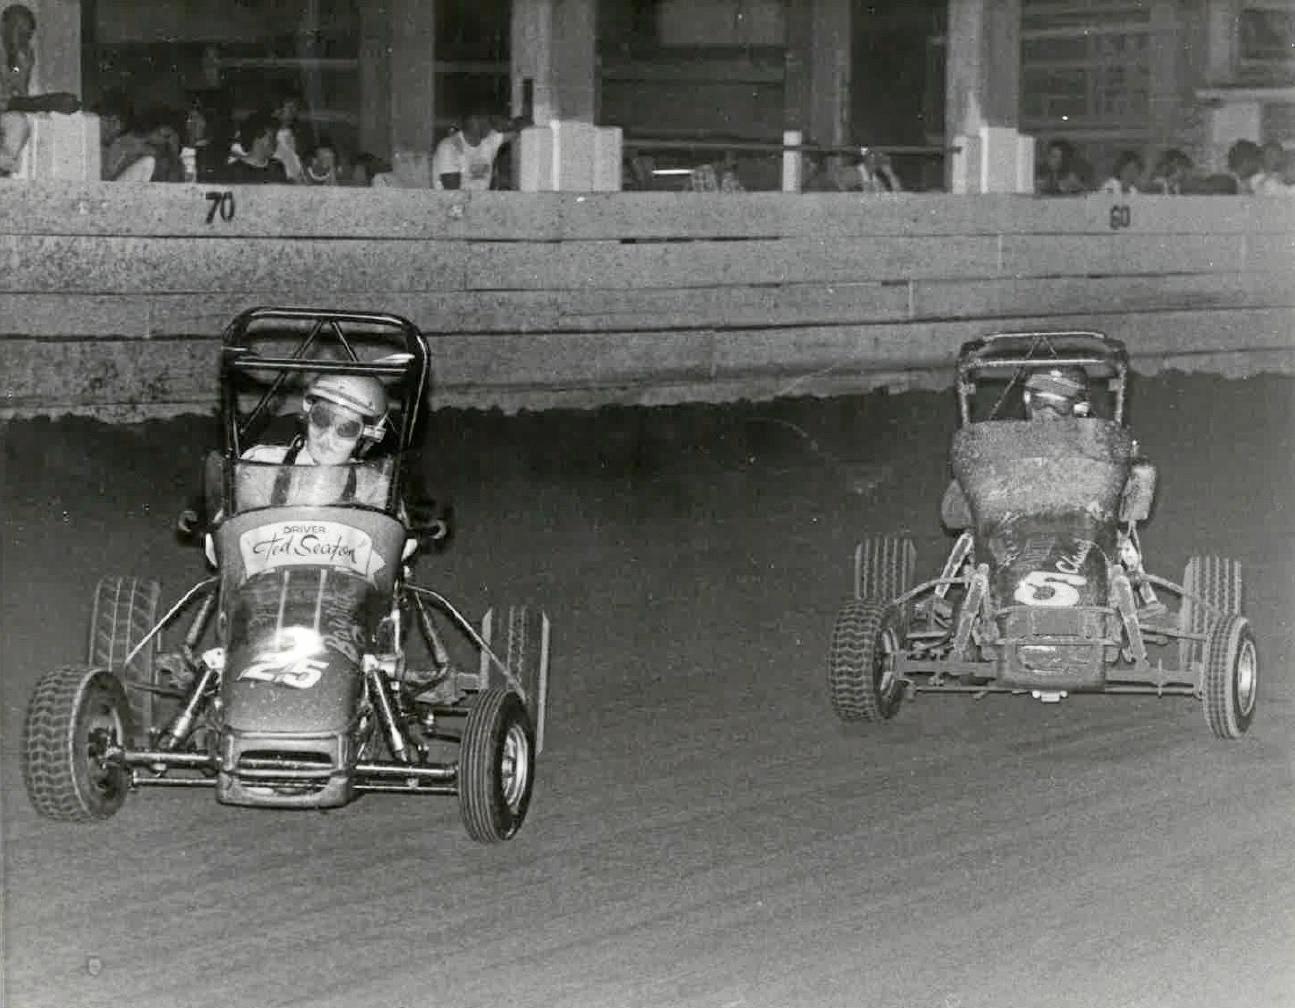 Ted Seaton, left, and John McFarlane racing their vehicles.